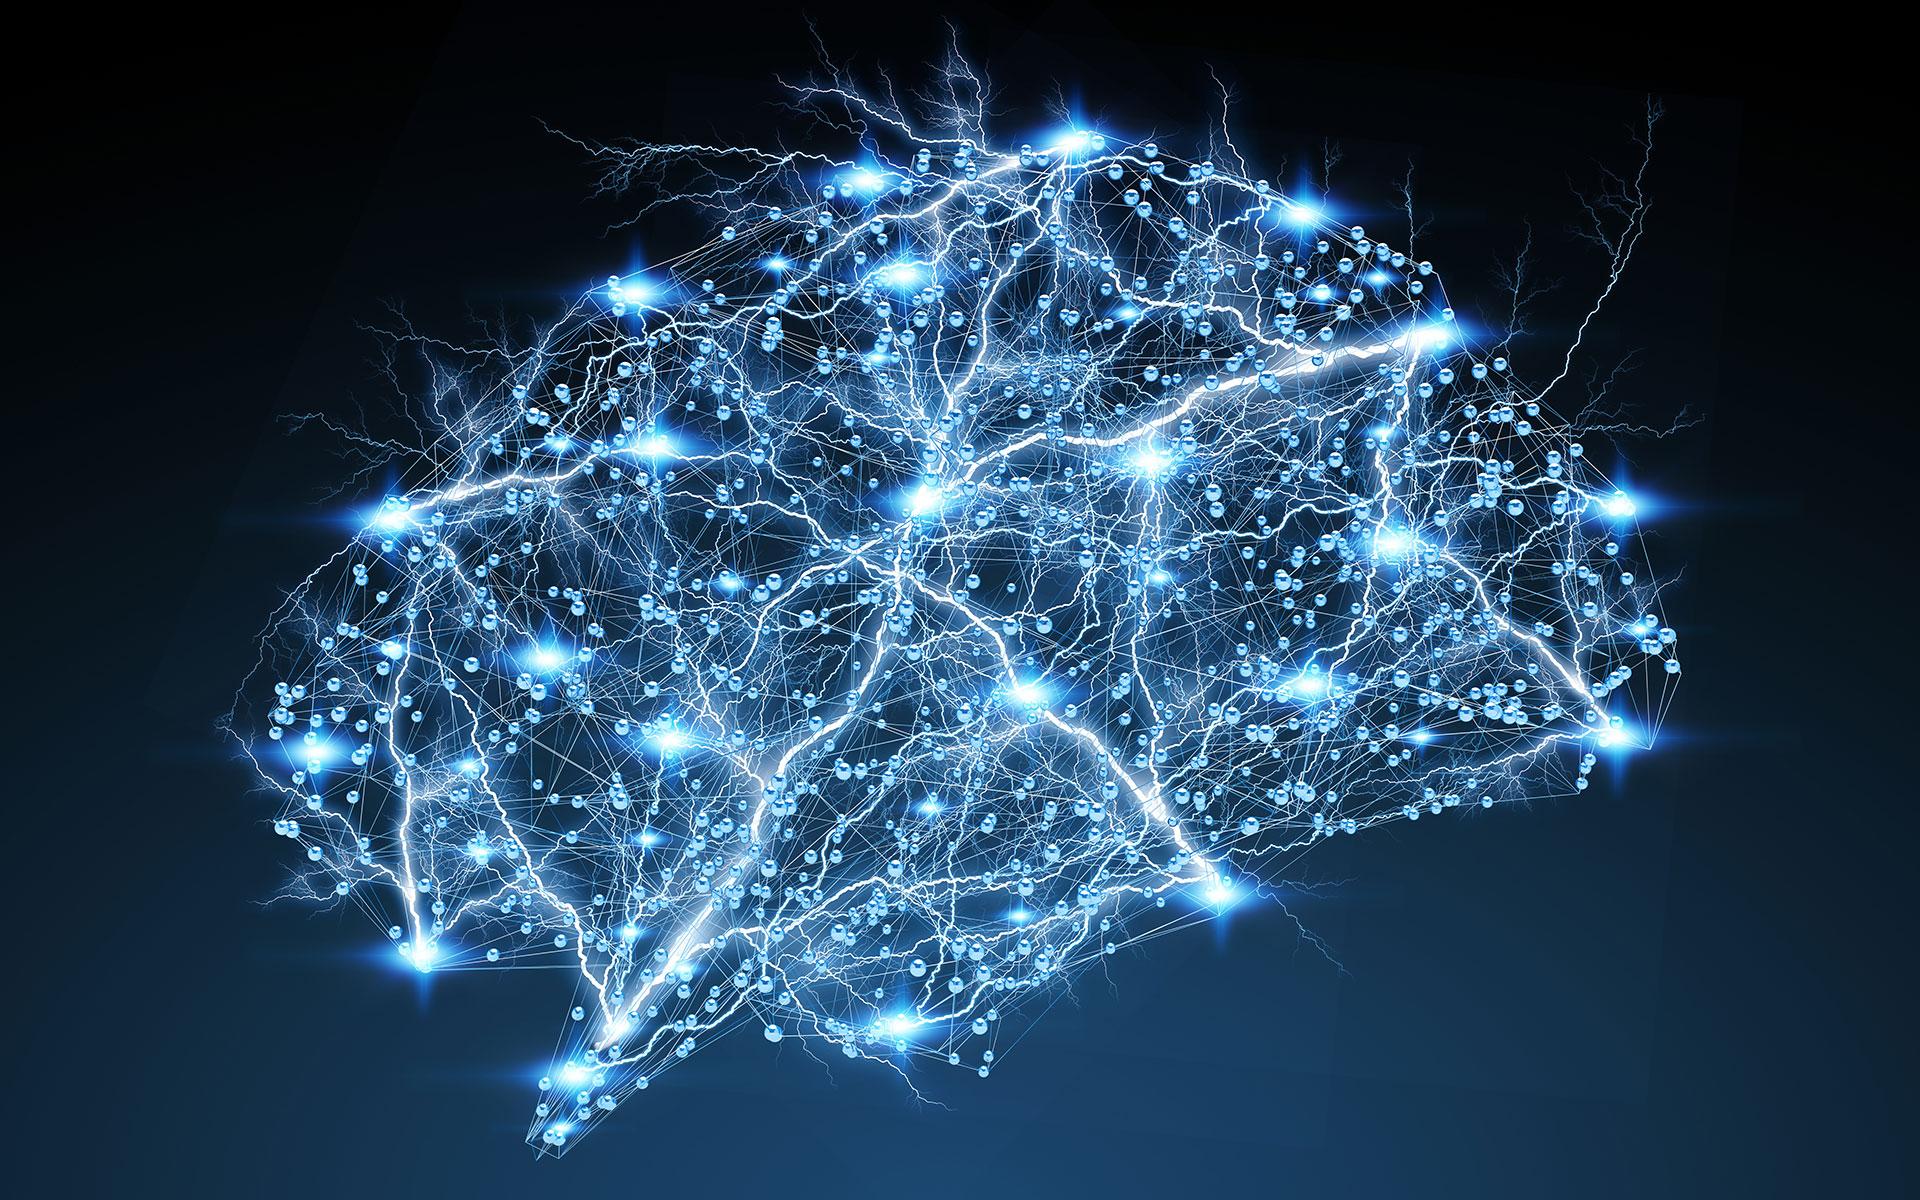 electrical circuits inside of a human brain